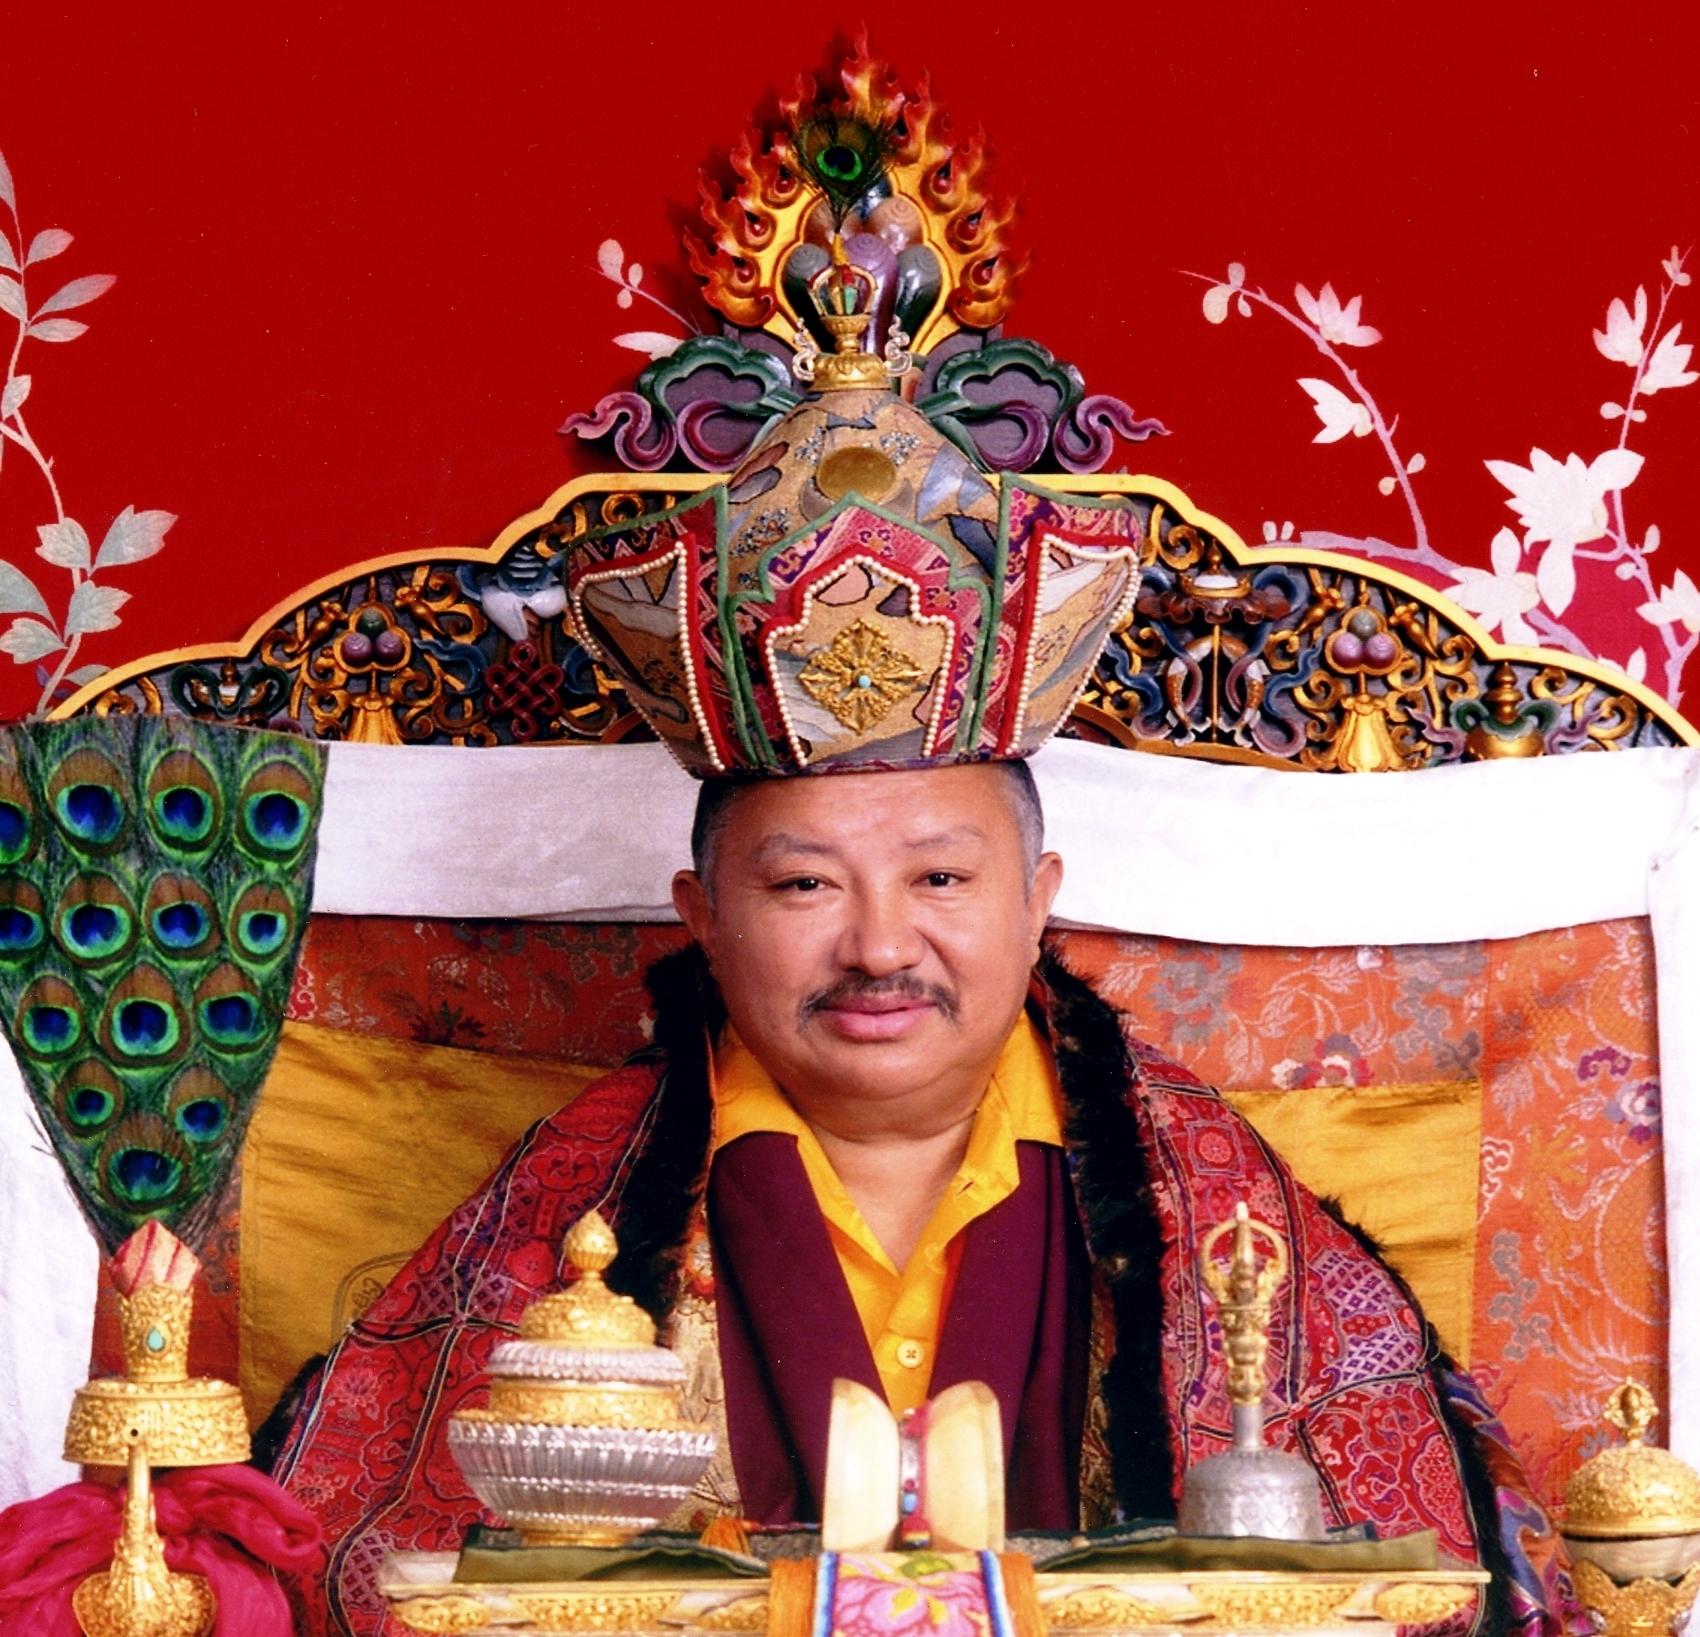 Chokling Rinpoche